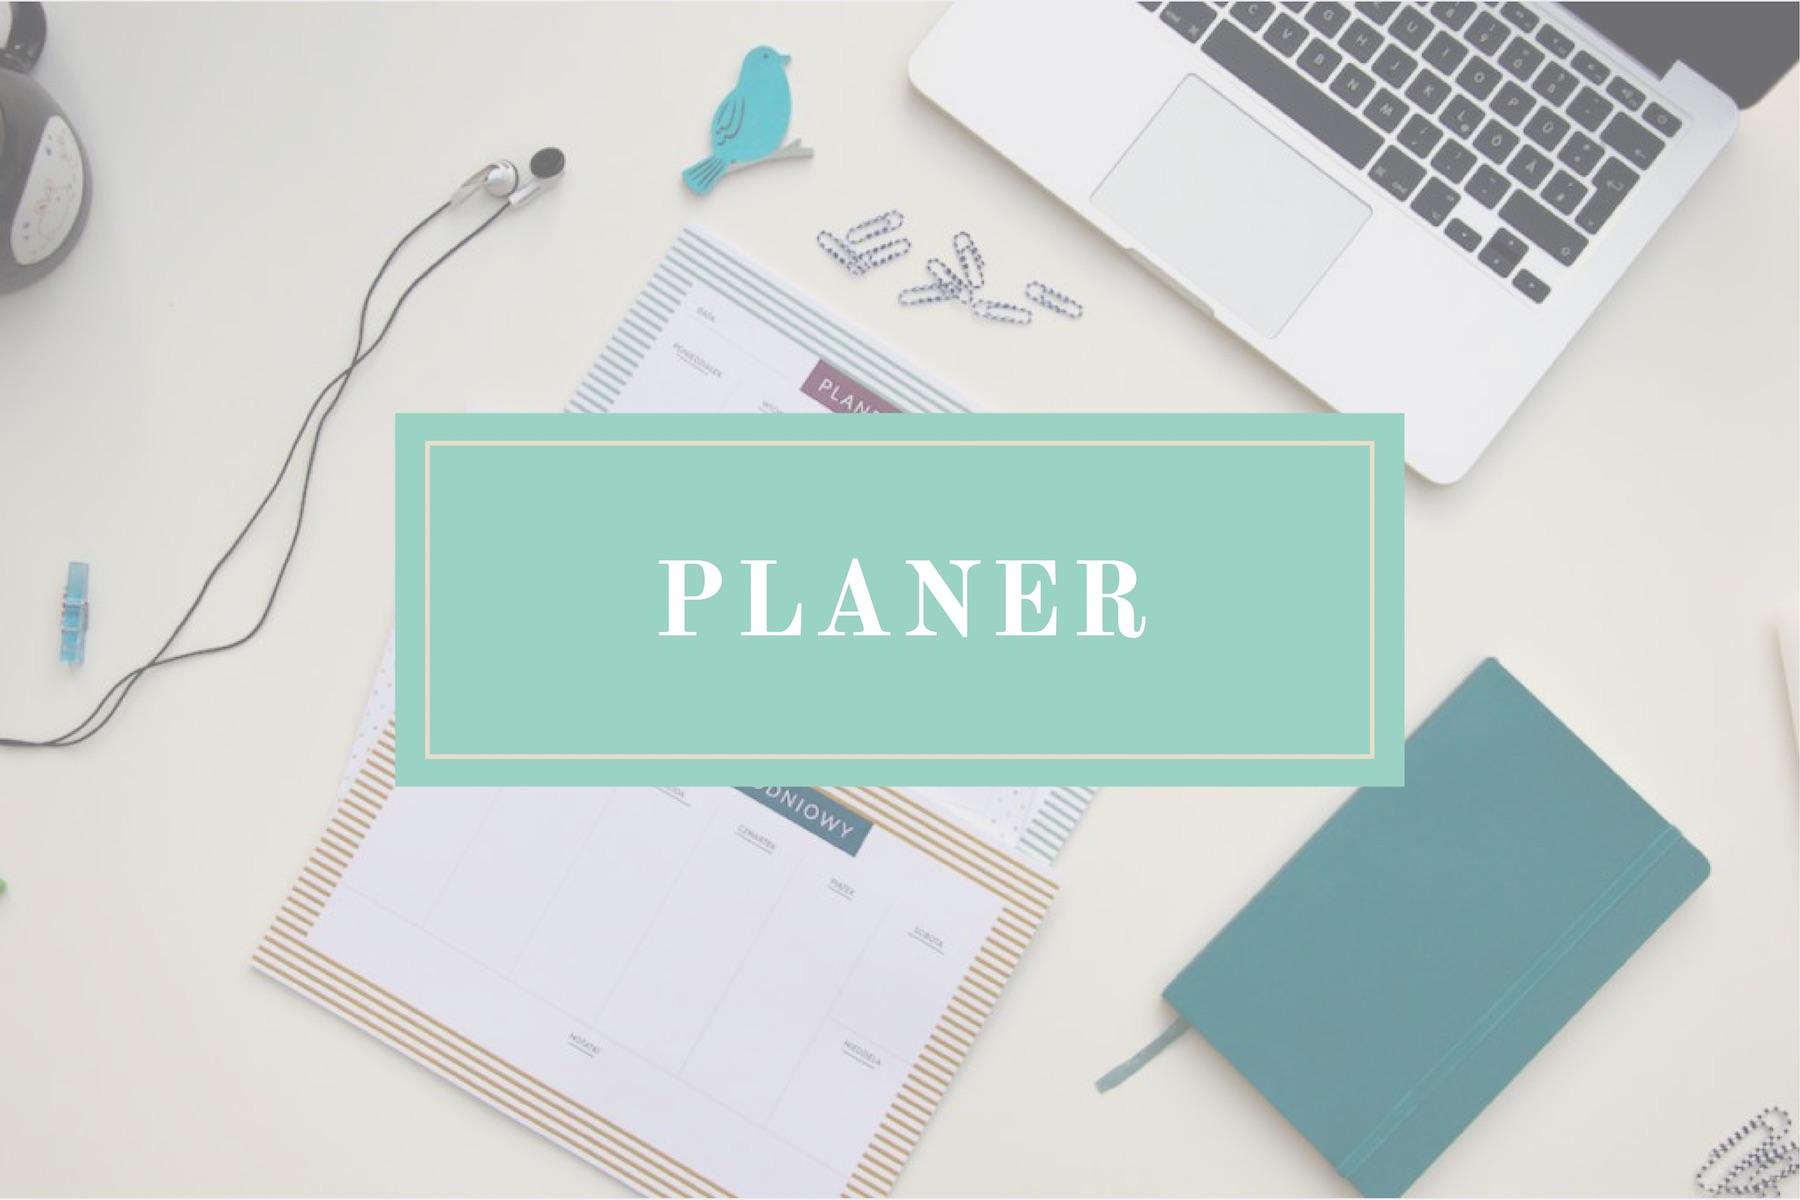 planer-main